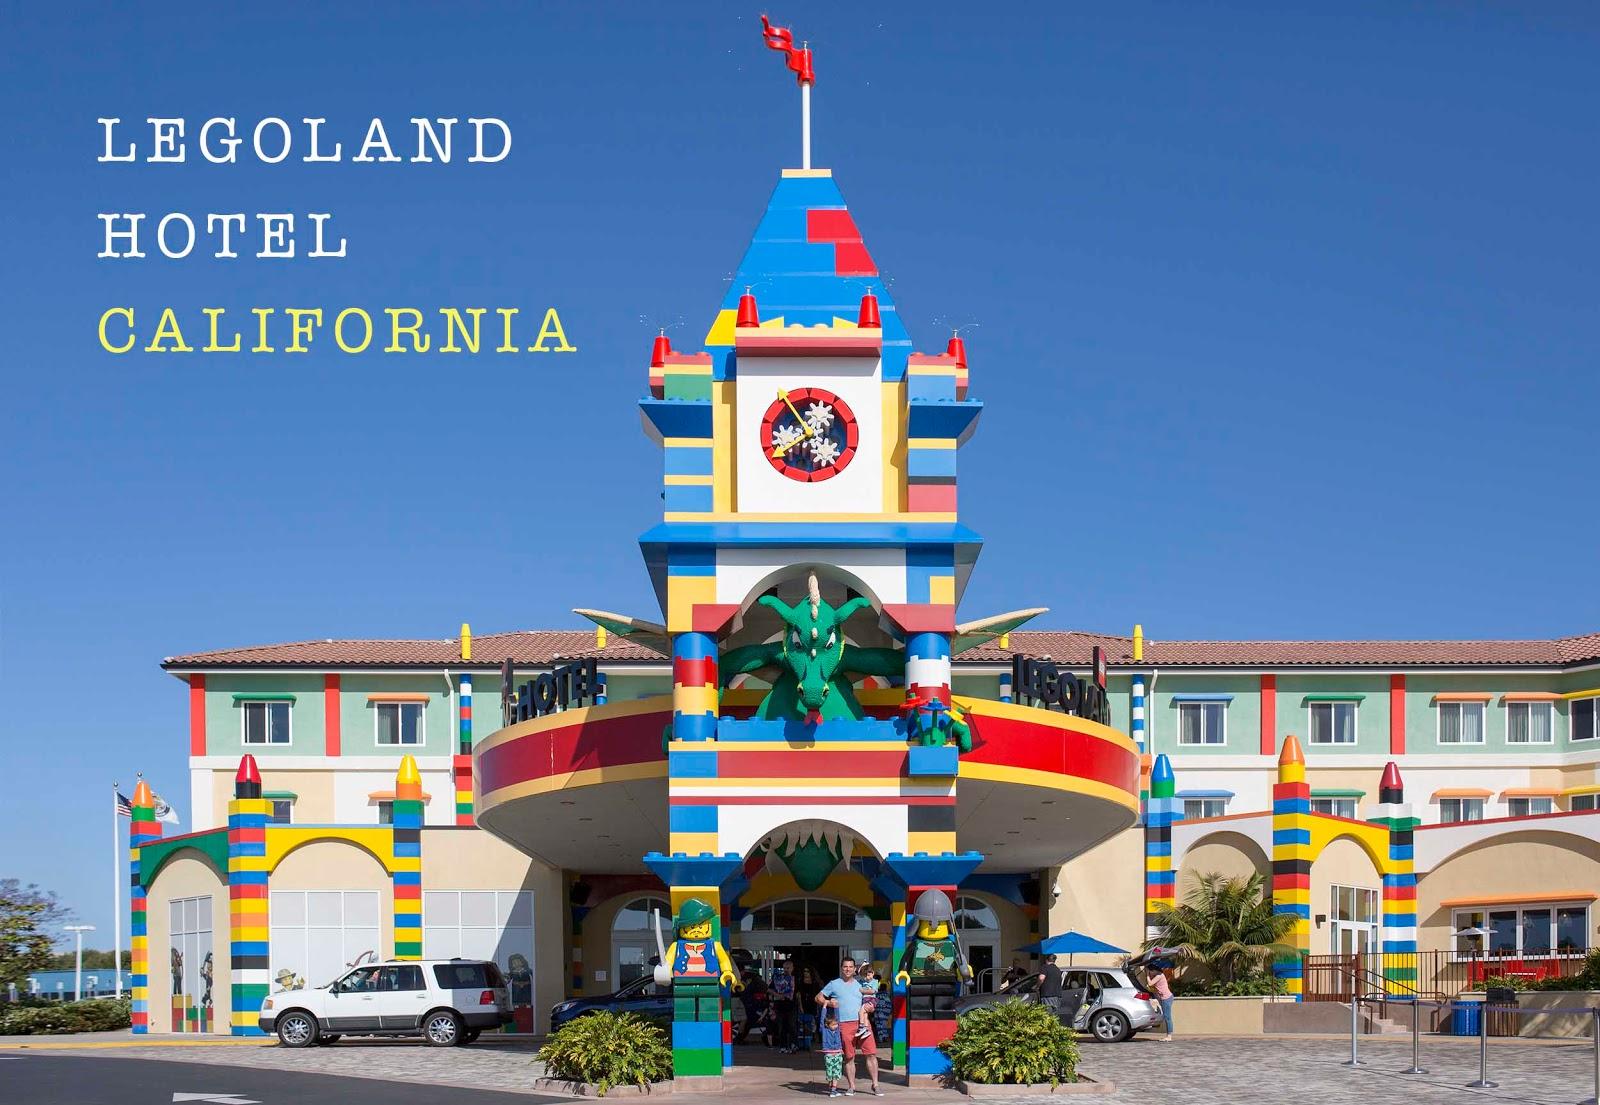 Legoland Hotel Ninjago Room California